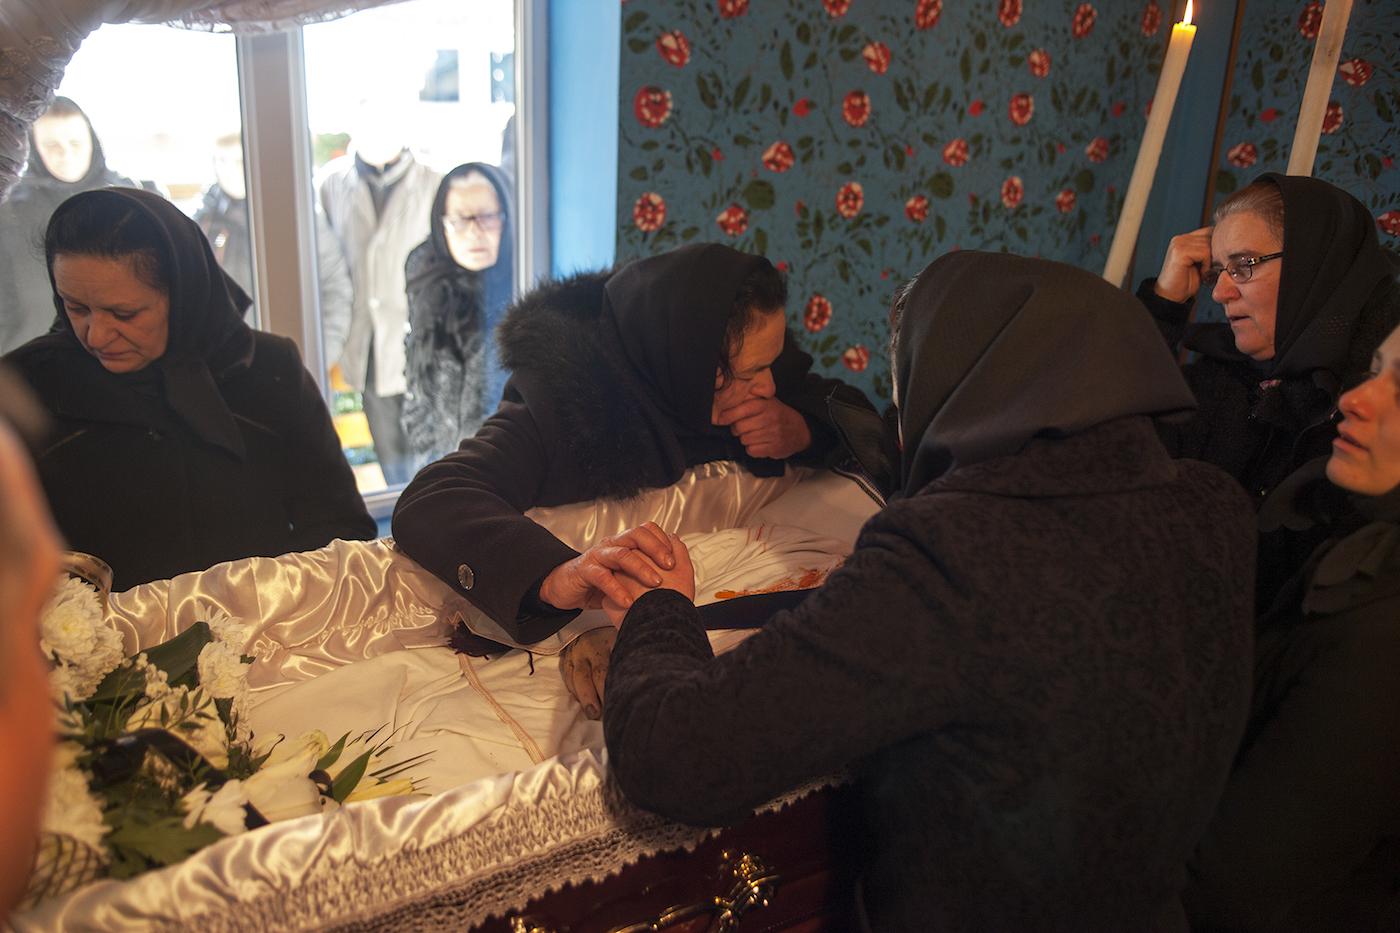 Di Săpânța, jenazah akan dibaringkan di ruangan khusus selama tiga hari. Foto: Silviu Gheție.